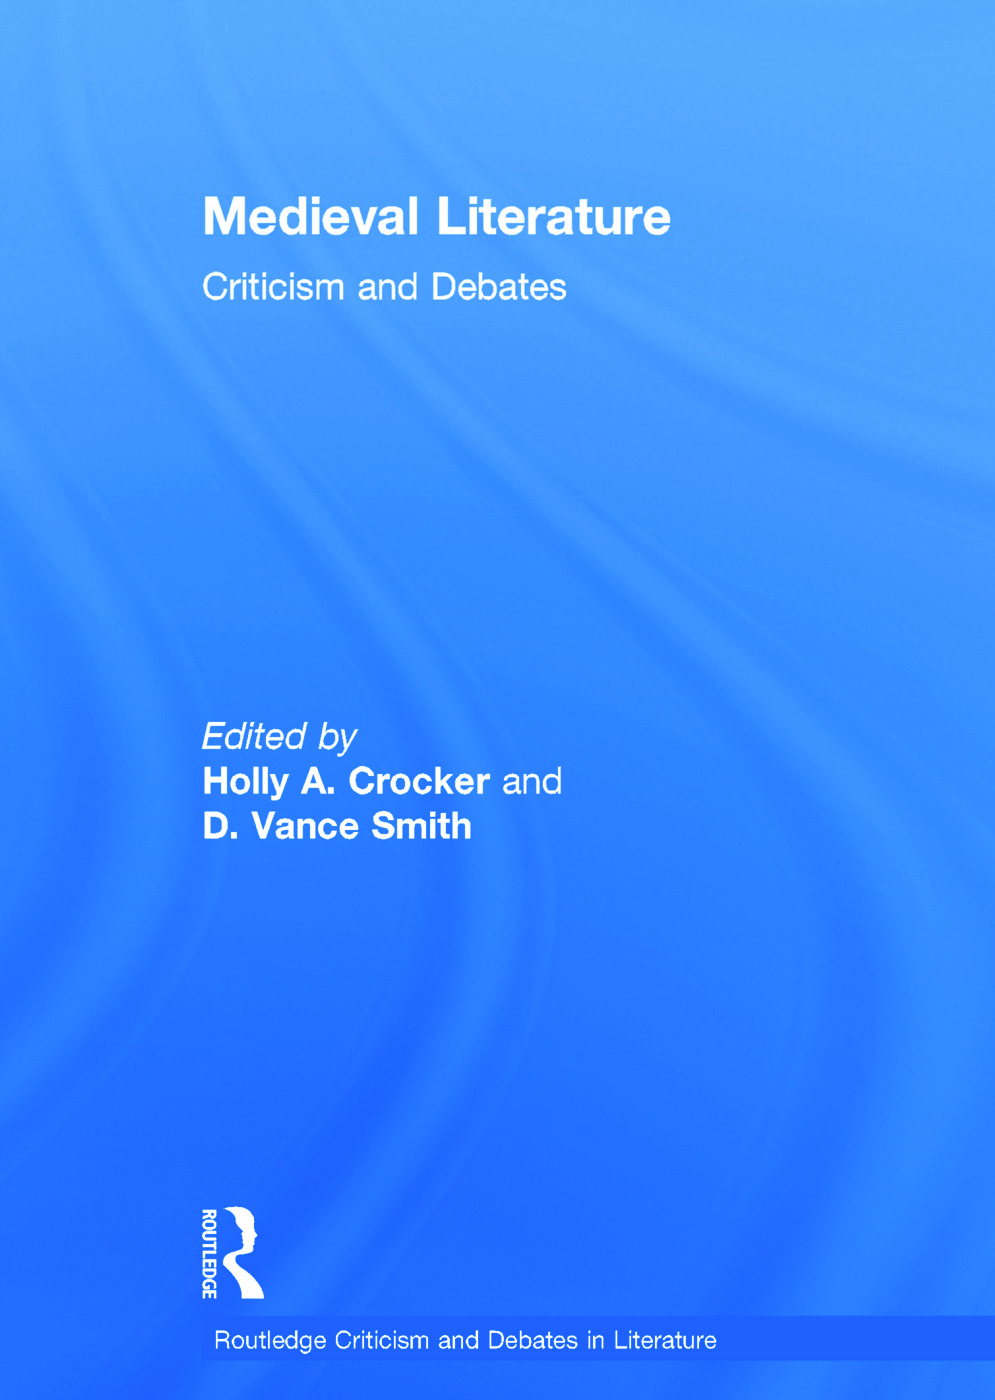 Medieval Literature: Criticism and Debates book cover